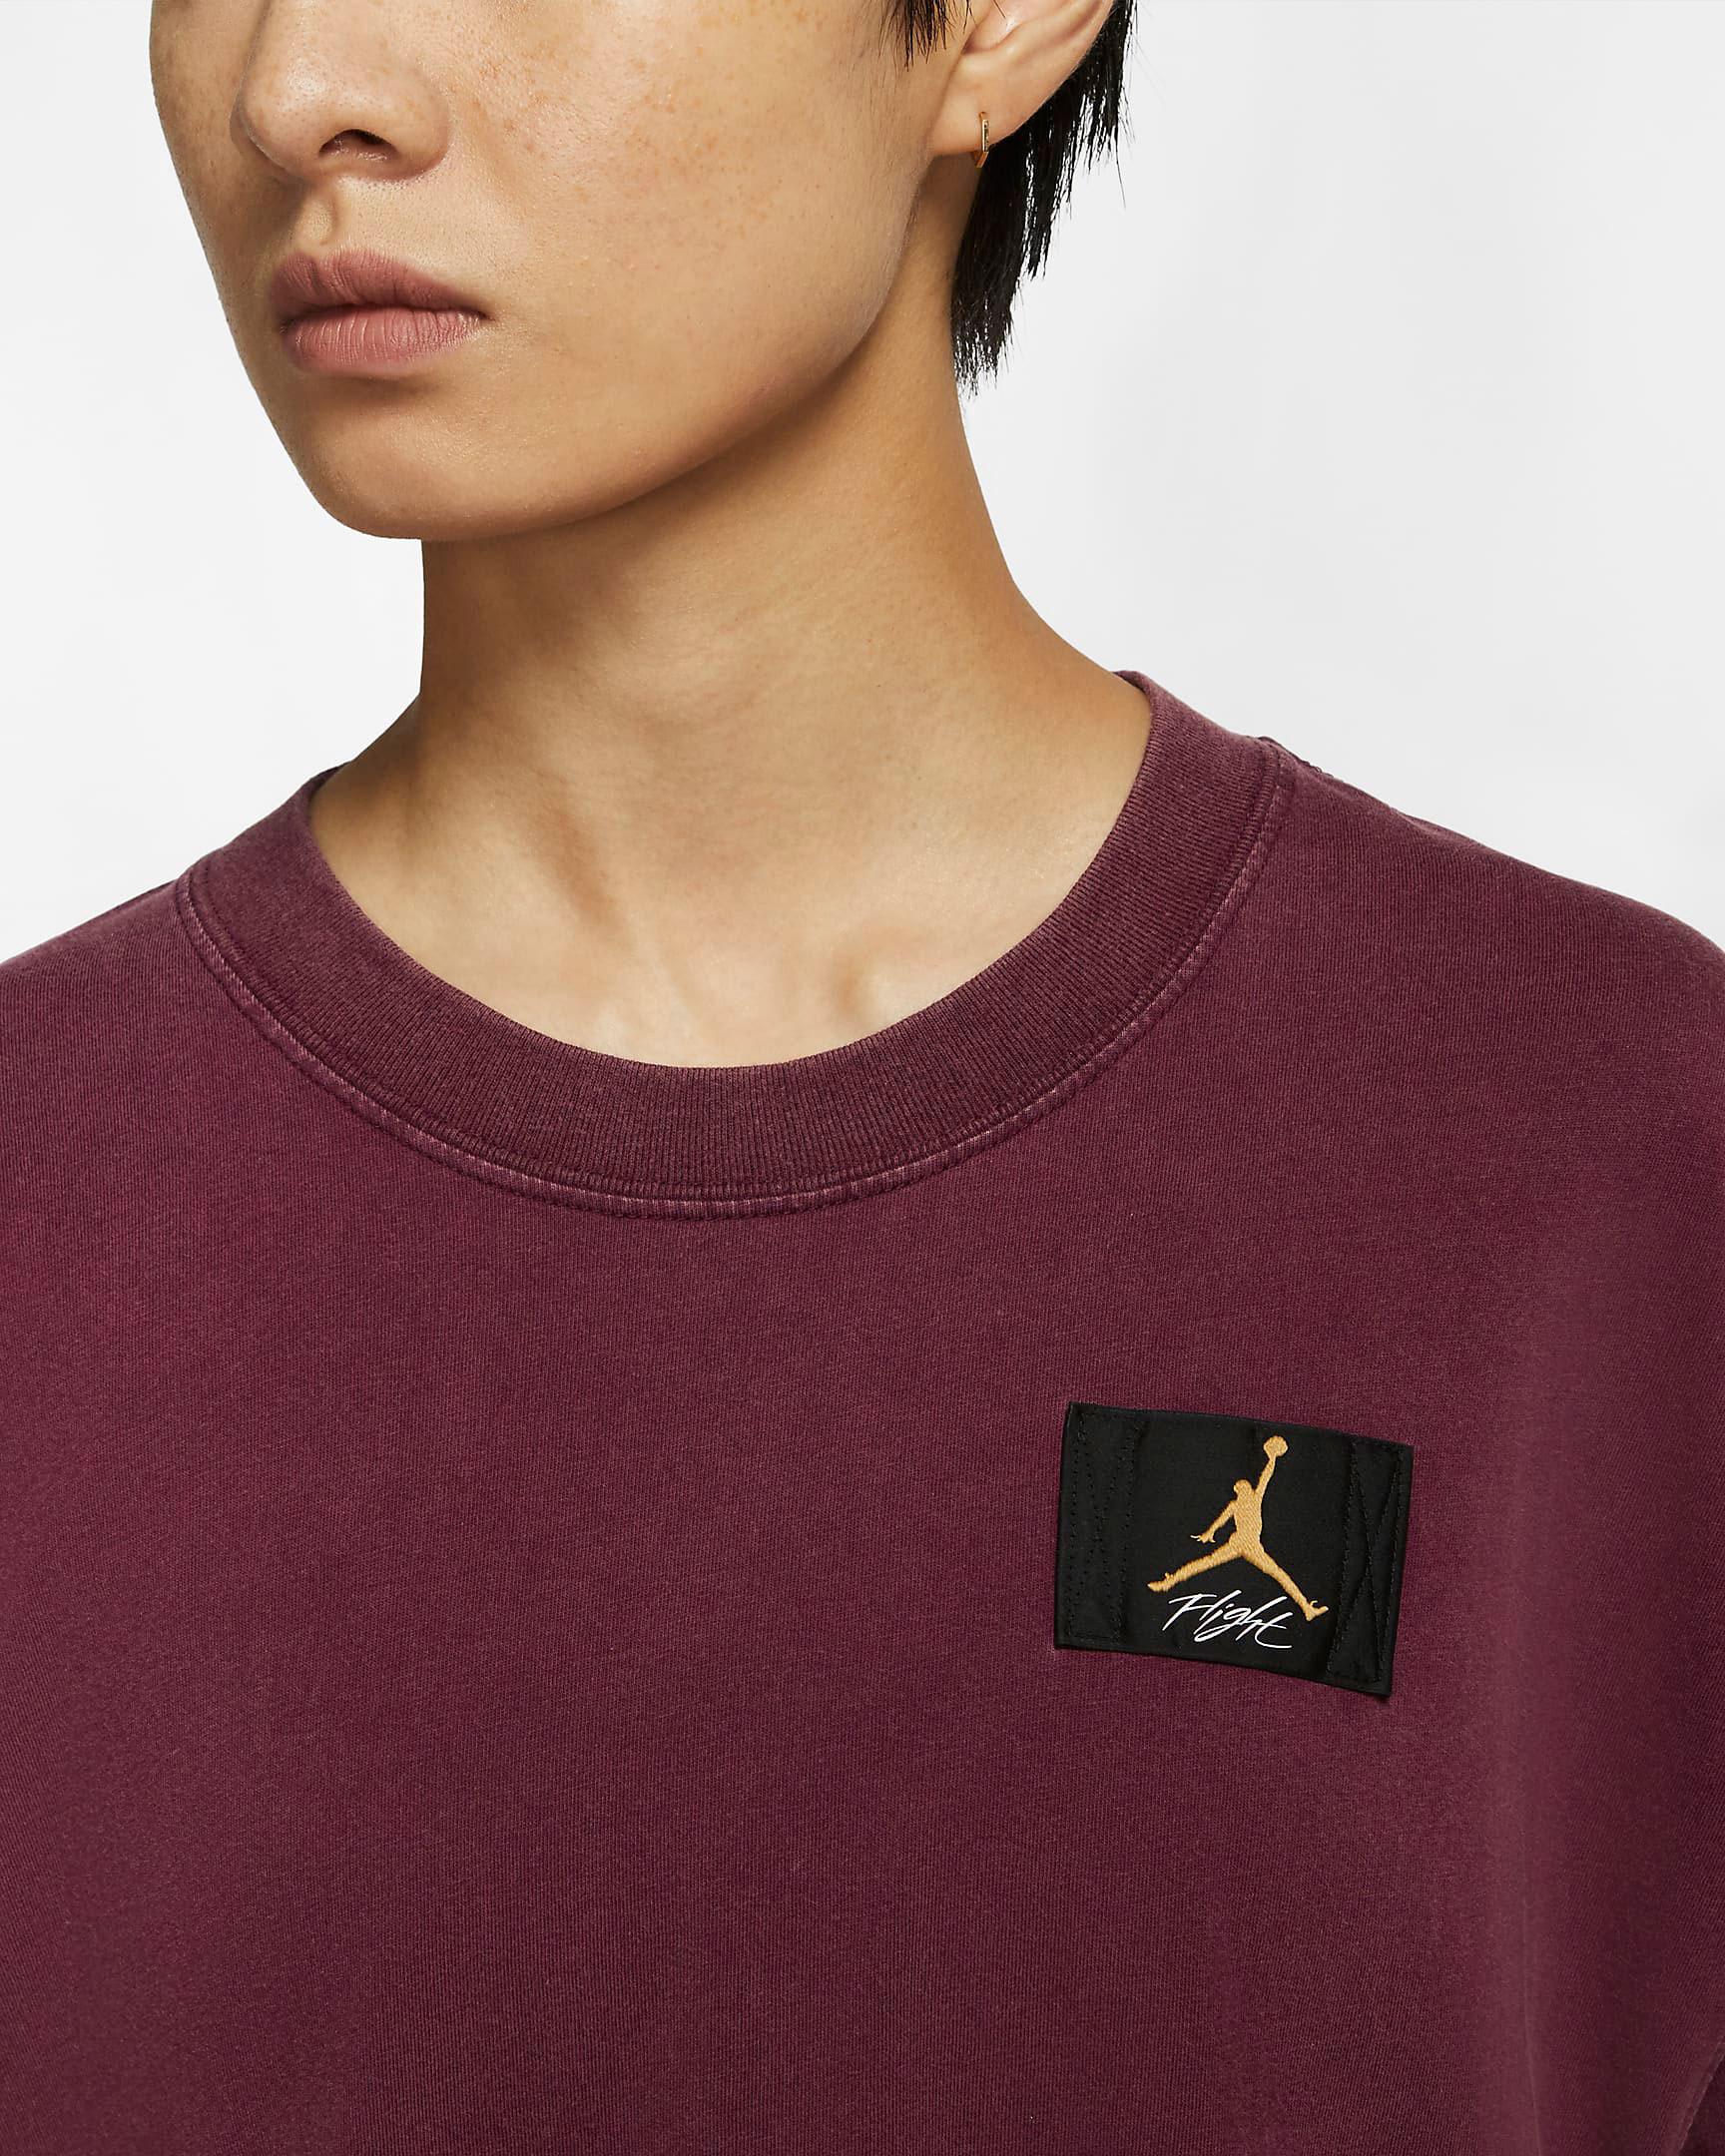 air-jordan-8-burgundy-beetroot-womens-jordan-tee-shirt